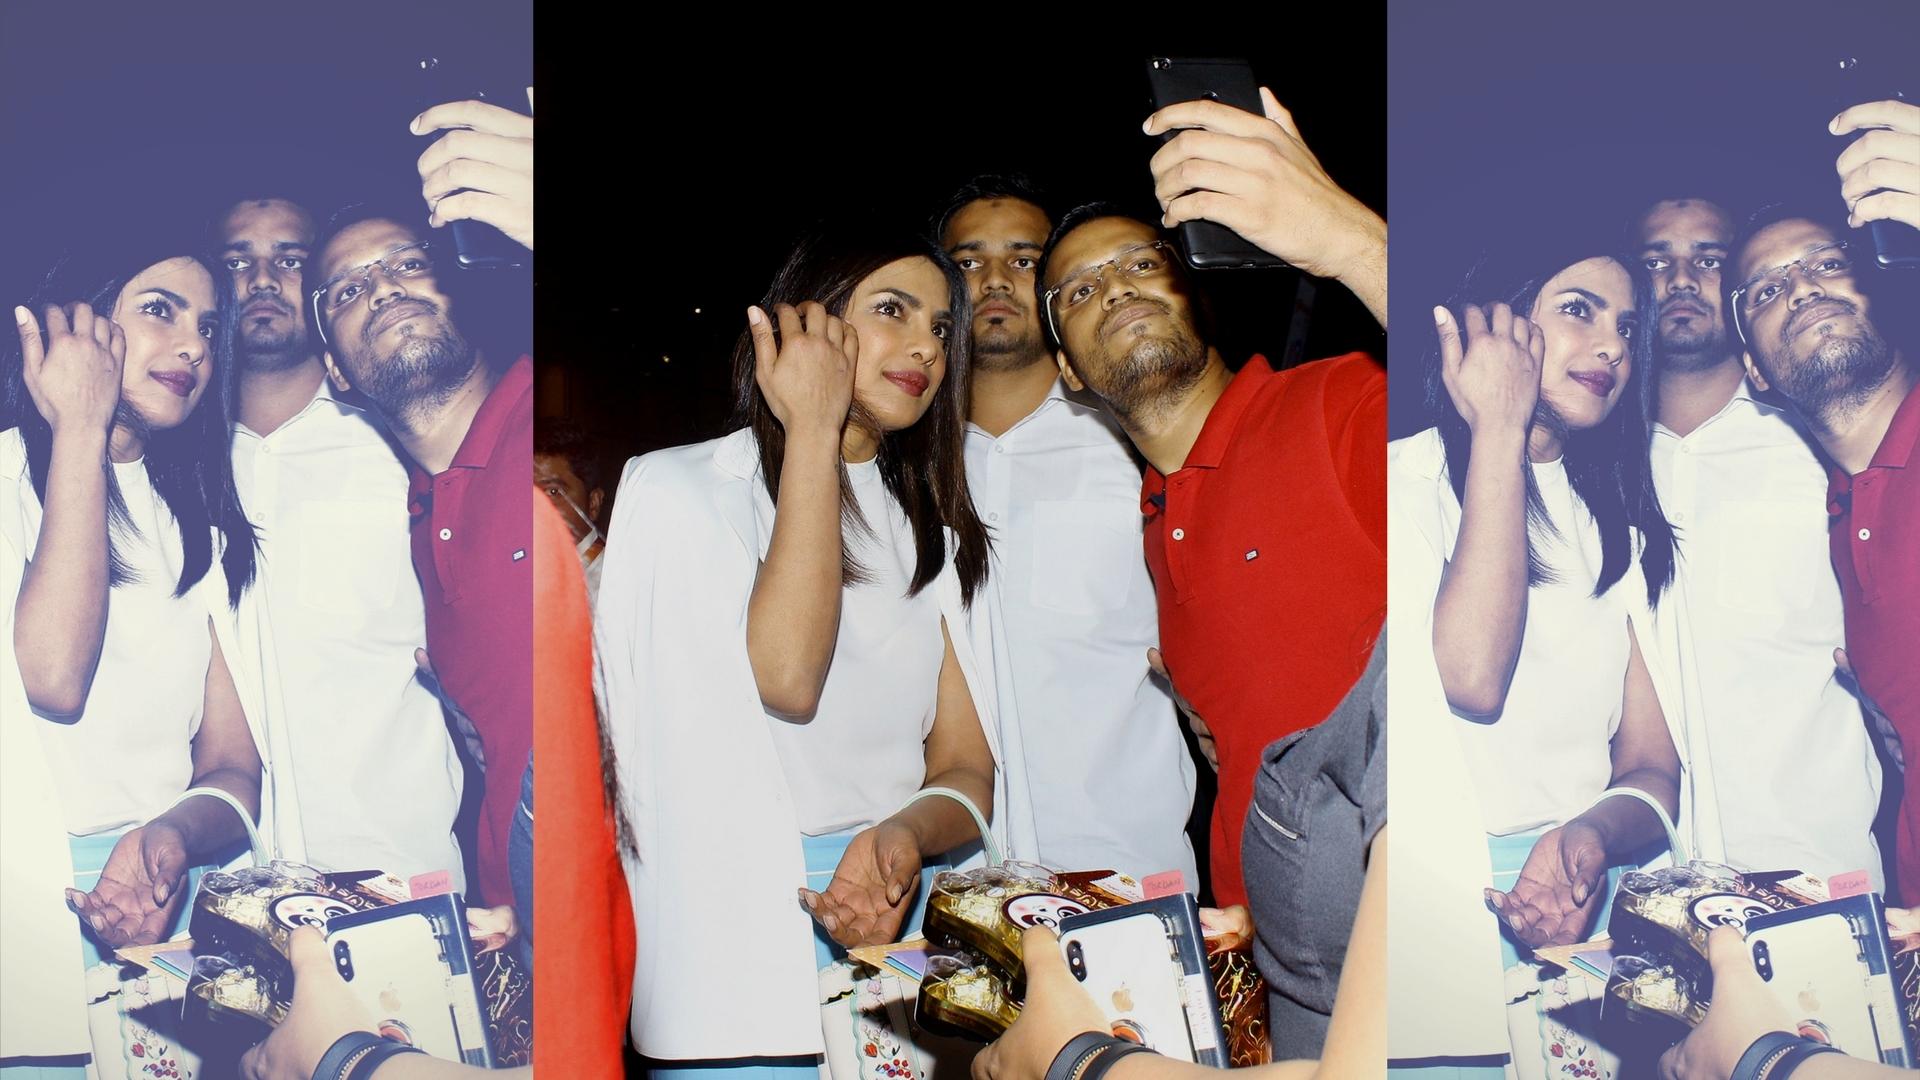 Before Jagga Jasoos Catch These 5 Saswata Chatterjee Films  # Pose Tele En Boi